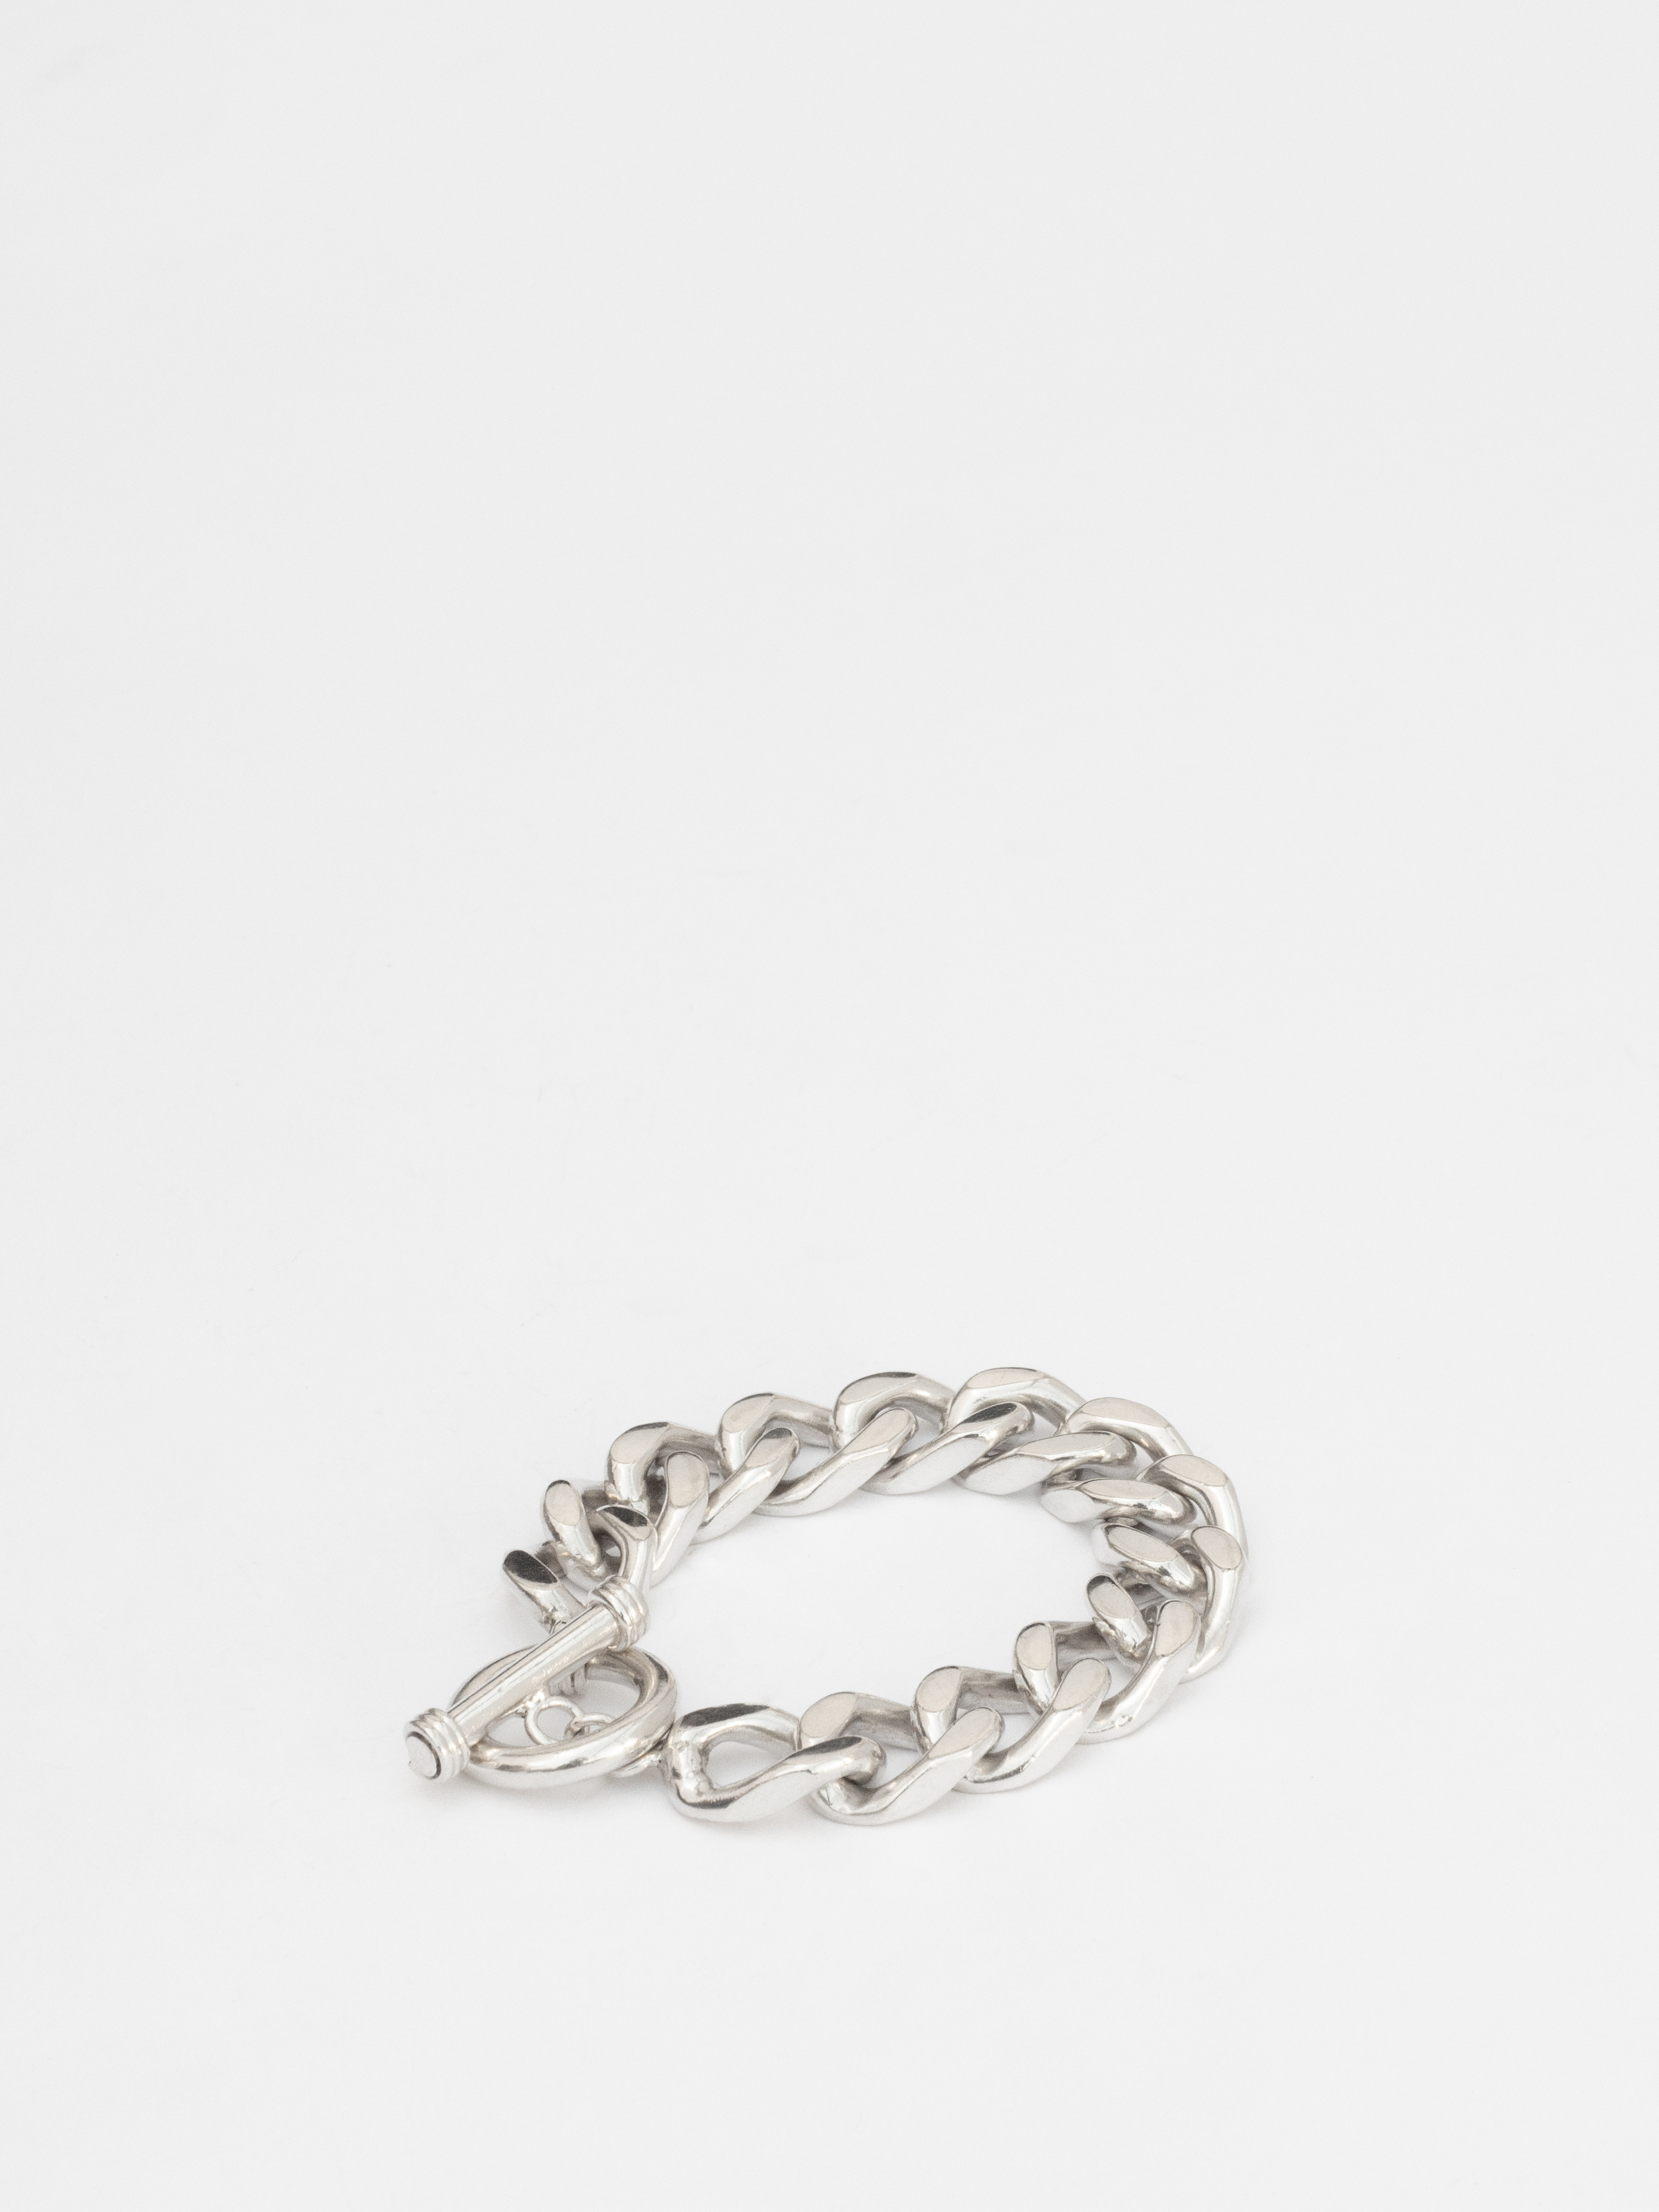 Flat Chain Link Bracelet / Mexico